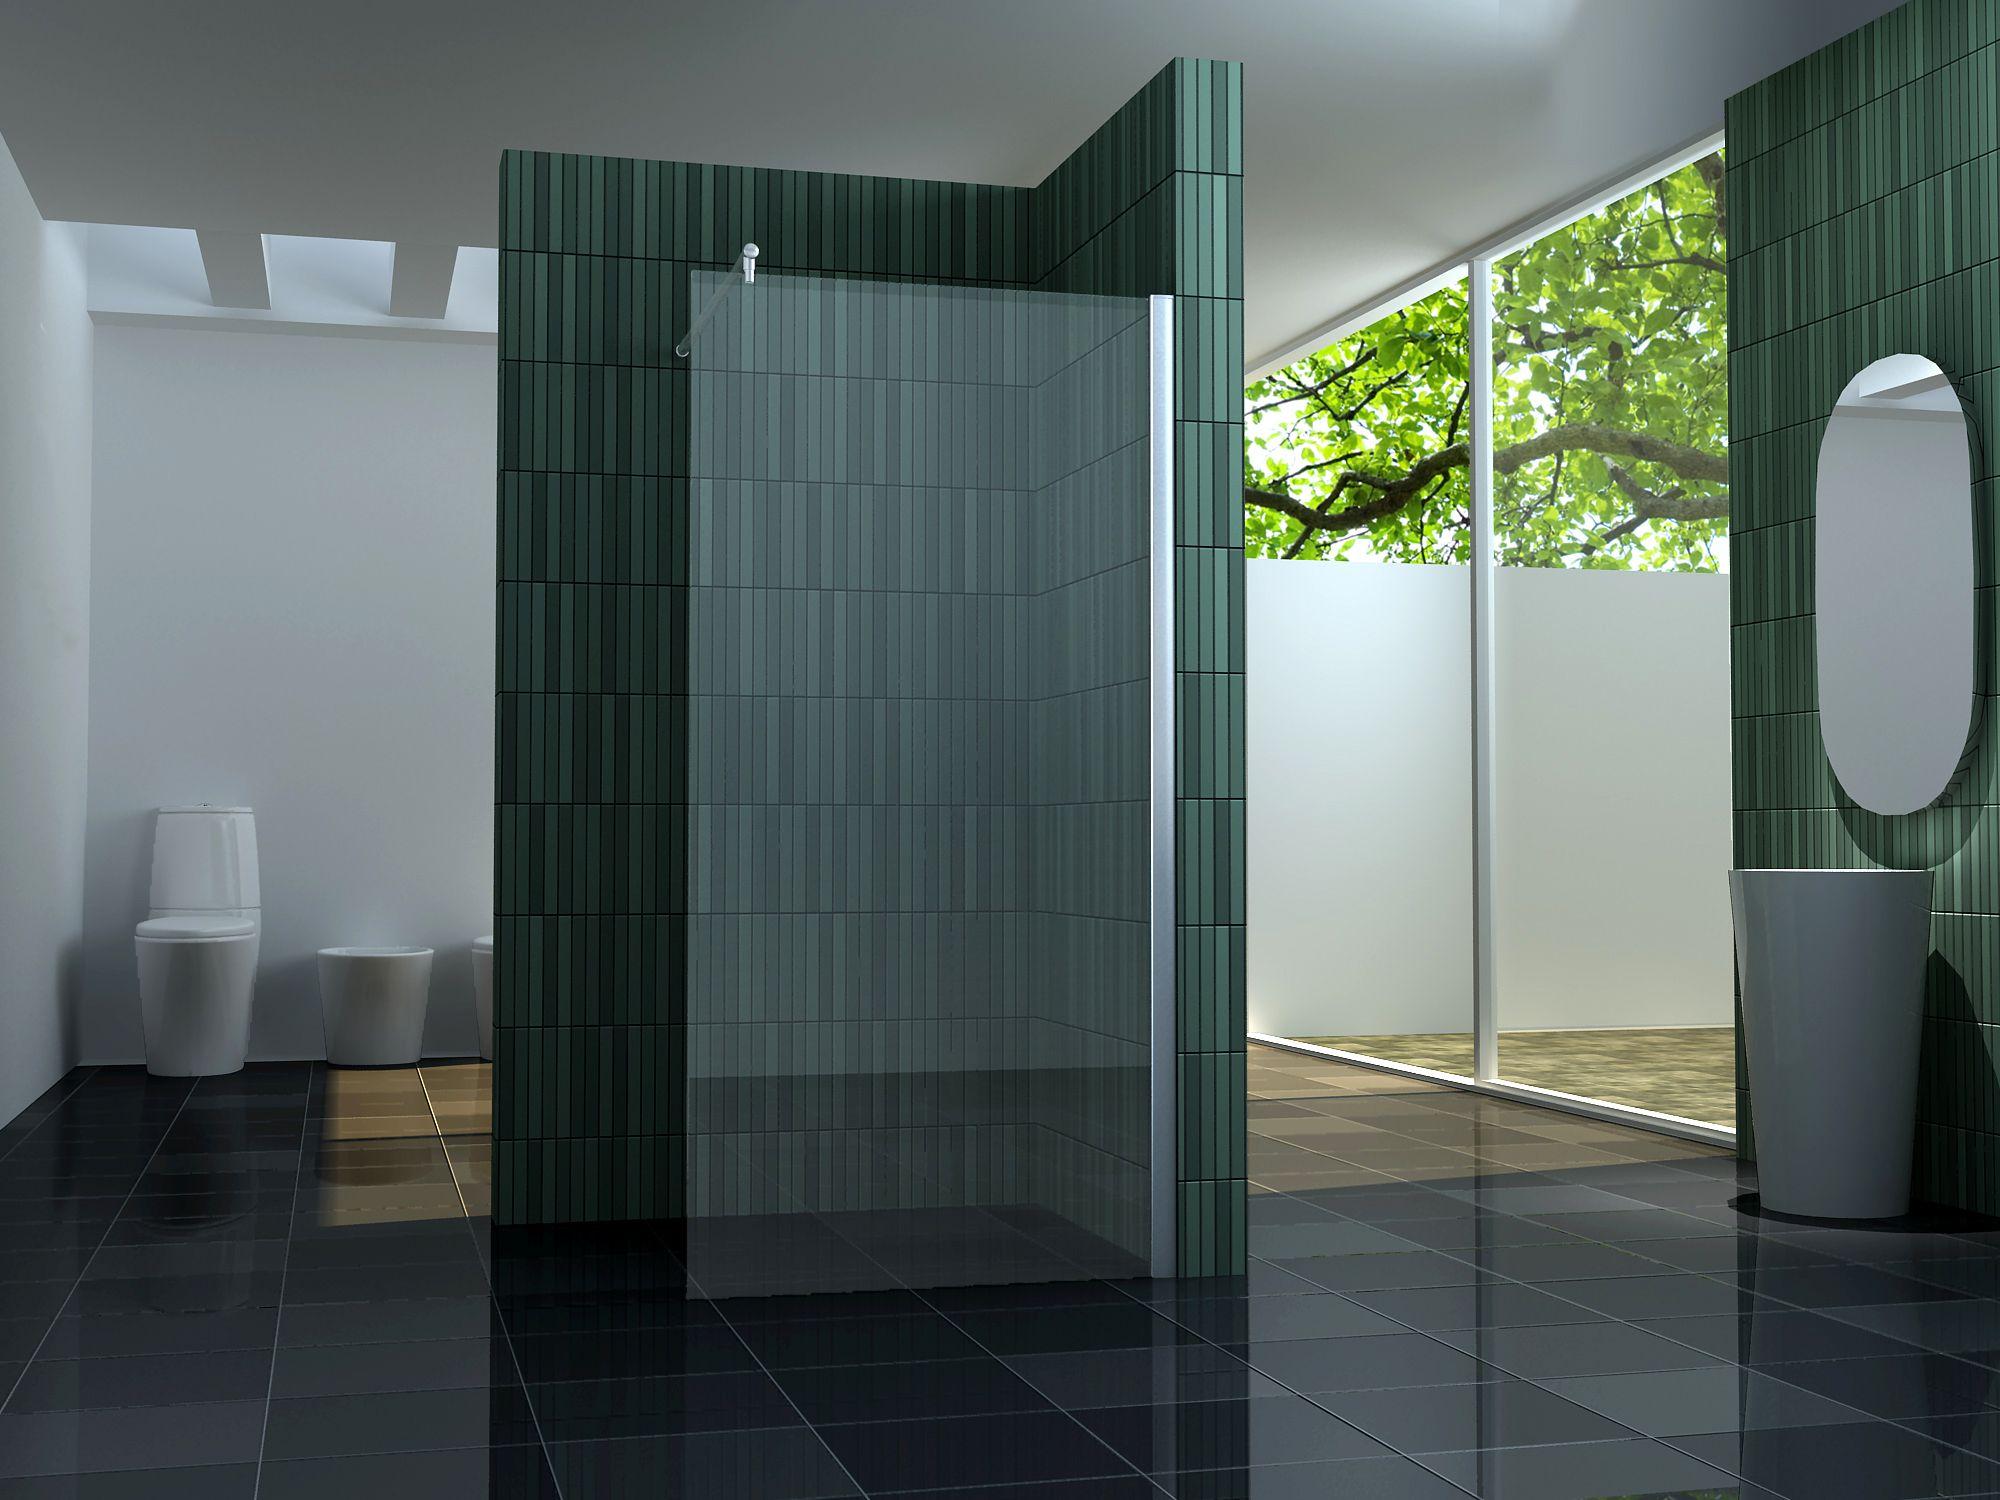 Badezimmer Glaswand